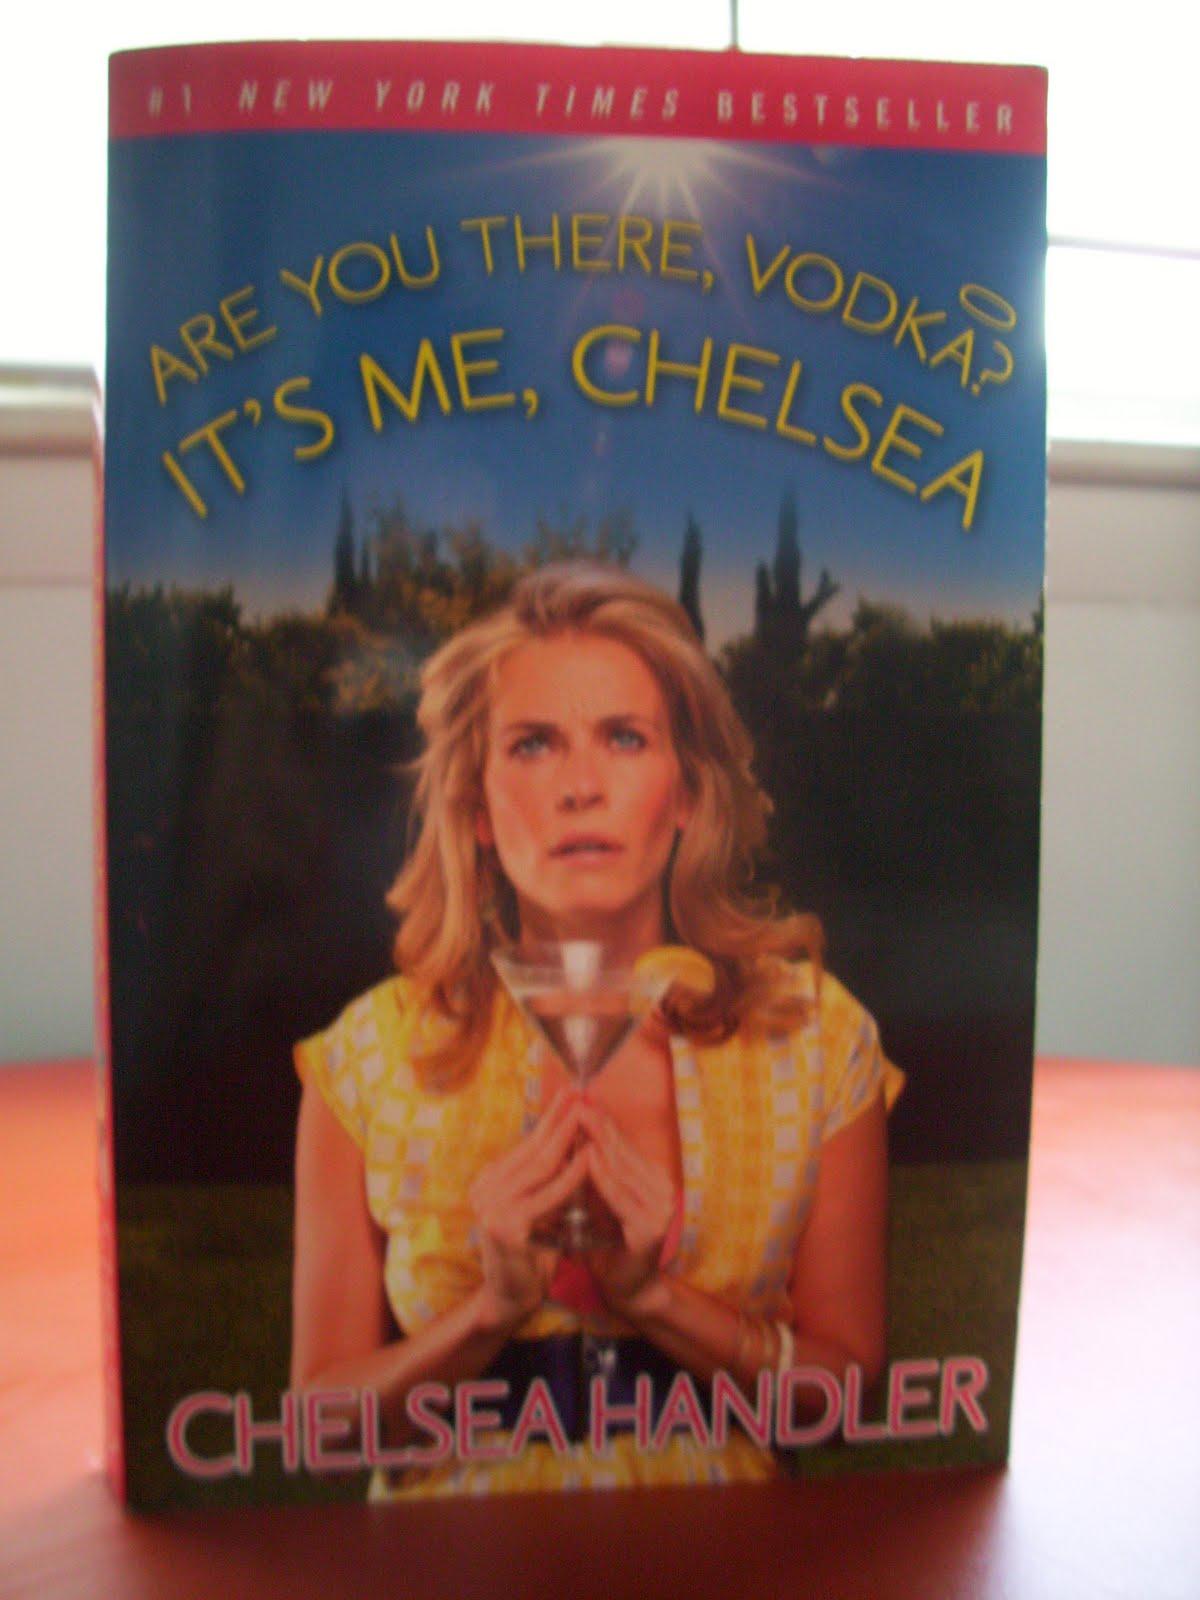 http://4.bp.blogspot.com/_JJKUATEn2Dc/TGdsp3tzgqI/AAAAAAAADNQ/DqaUJv-ceLM/s1600/Are+You+There+Vodka+It%27s+Me+Chelsea_Chelsea+Handler.JPG